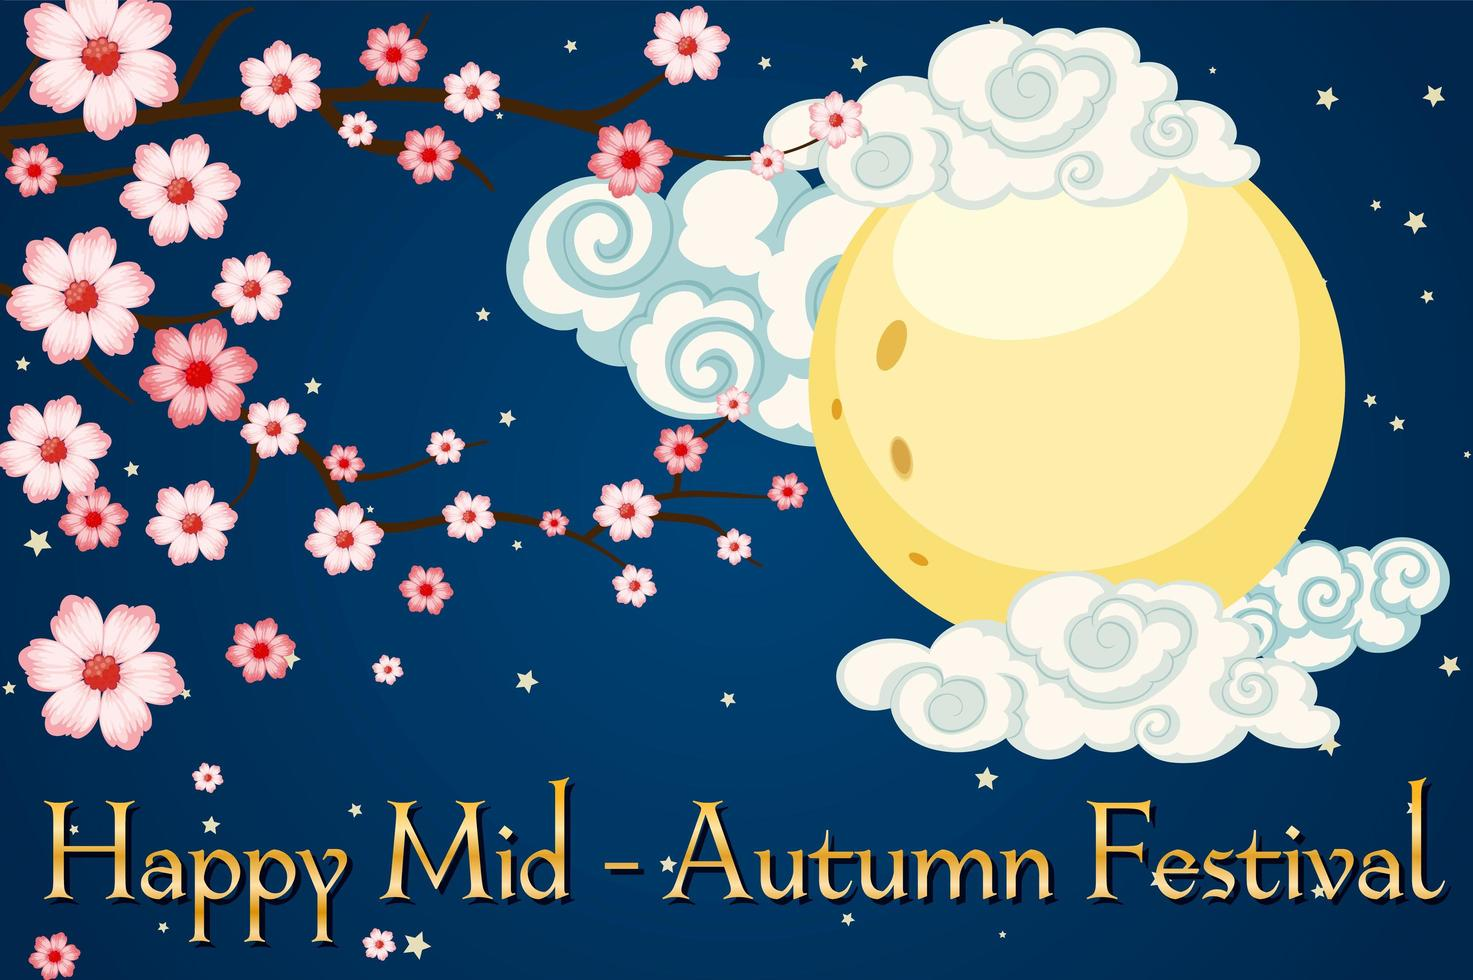 mid-autumn festival banner achtergrond vector